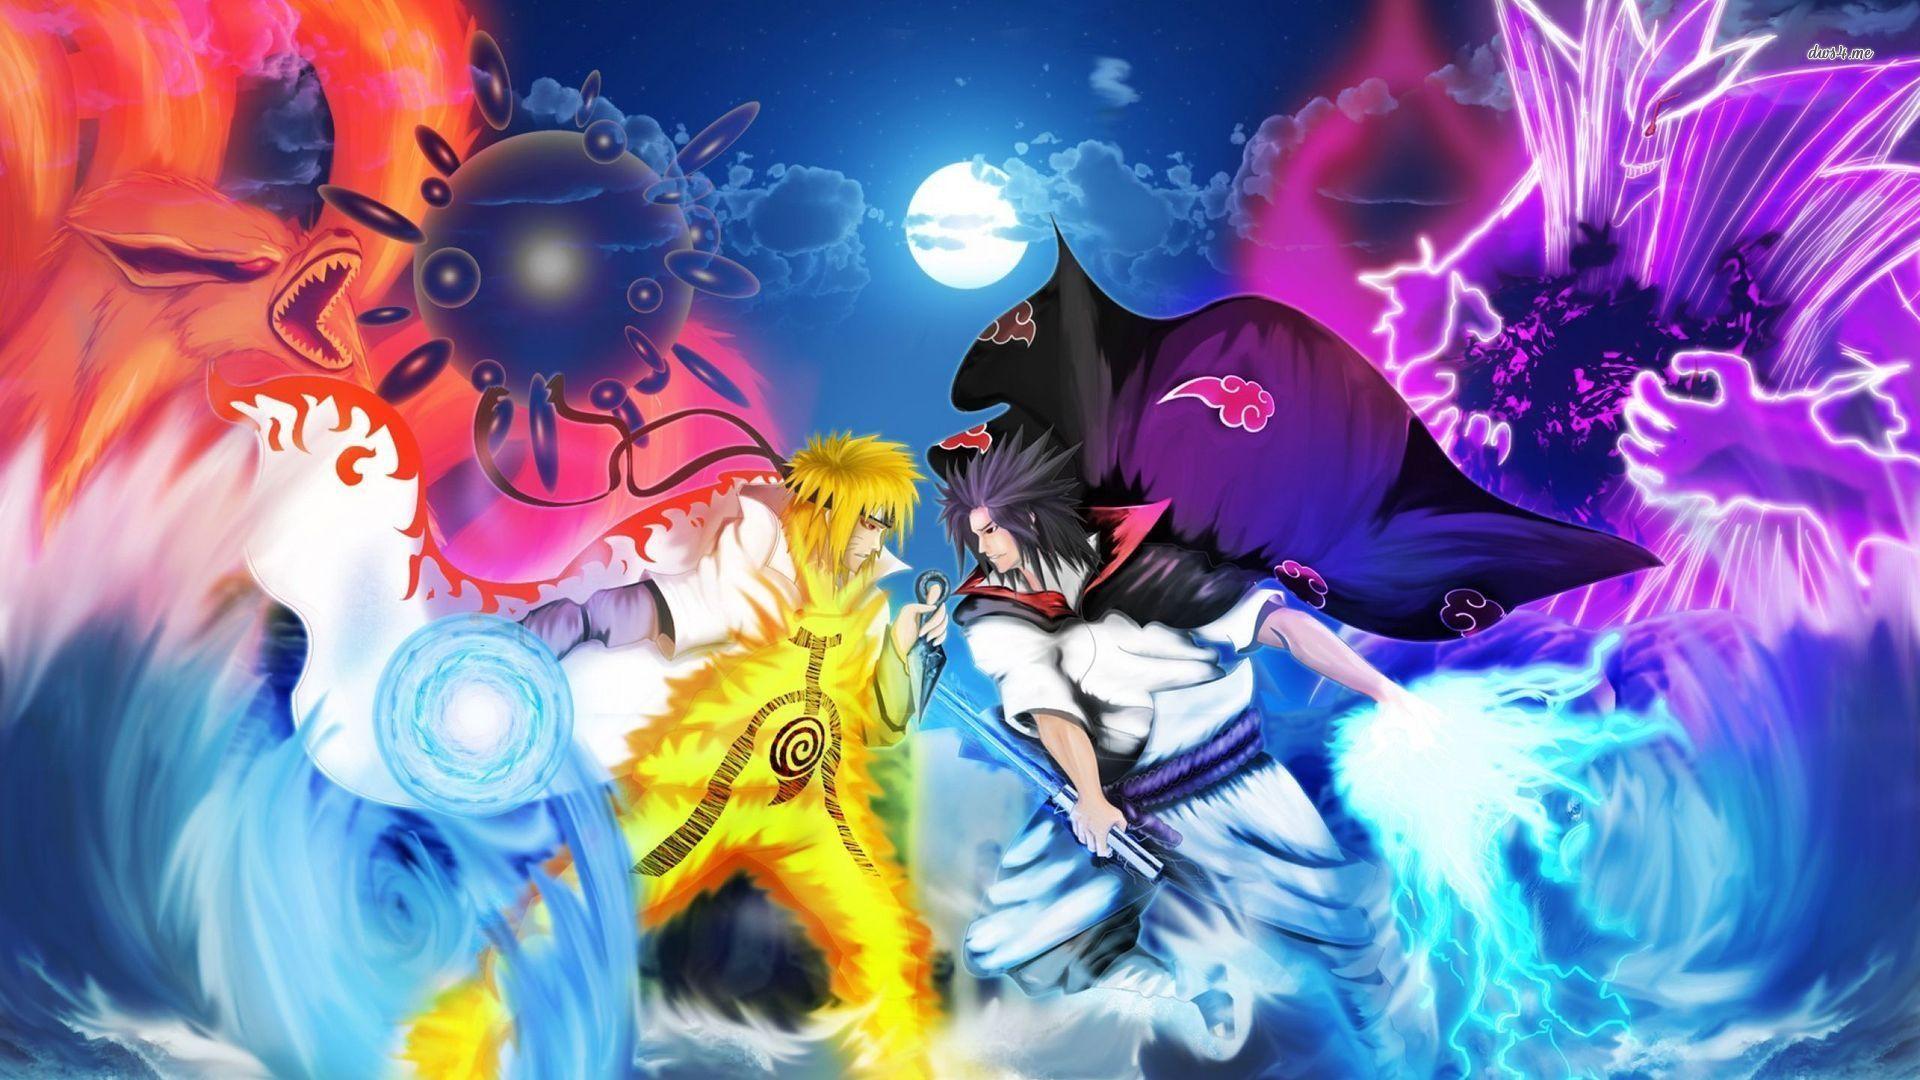 Naruto and Sasuke, Download Wallpaper